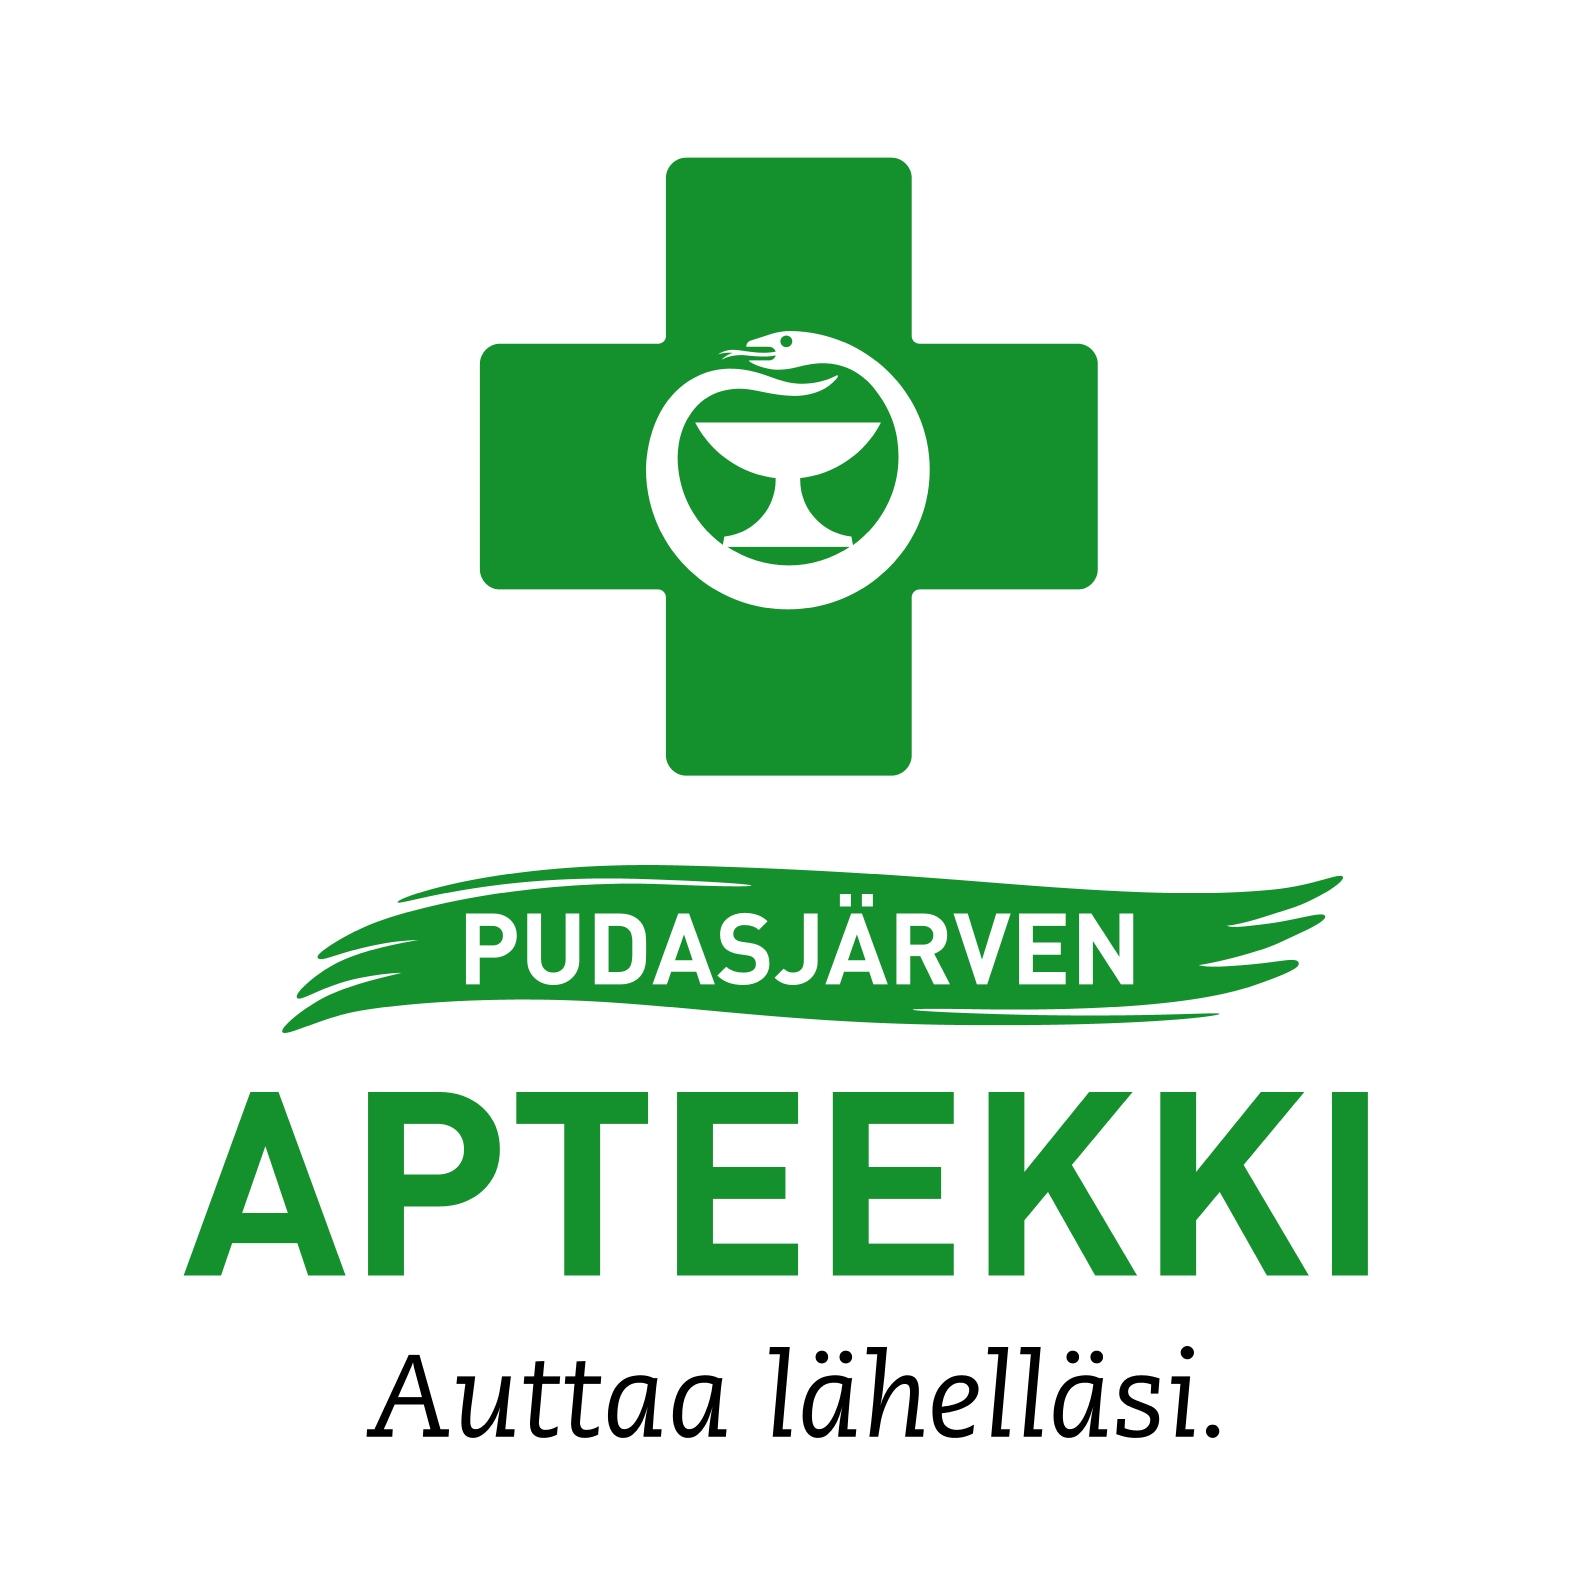 Pudasj_rven_20Apteekki_20pystylogo